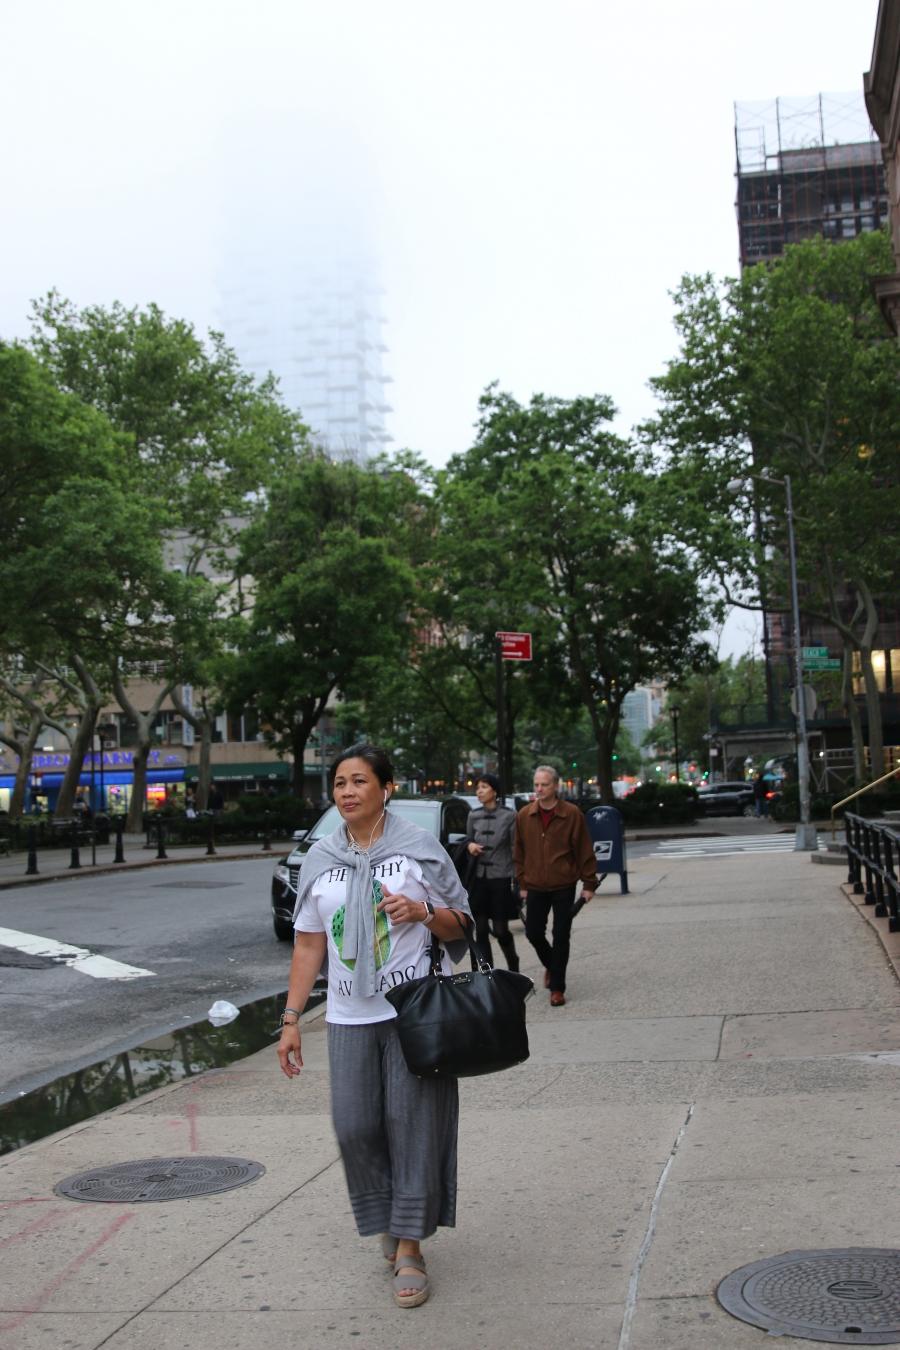 Woman walking on city sidewalk holding purse